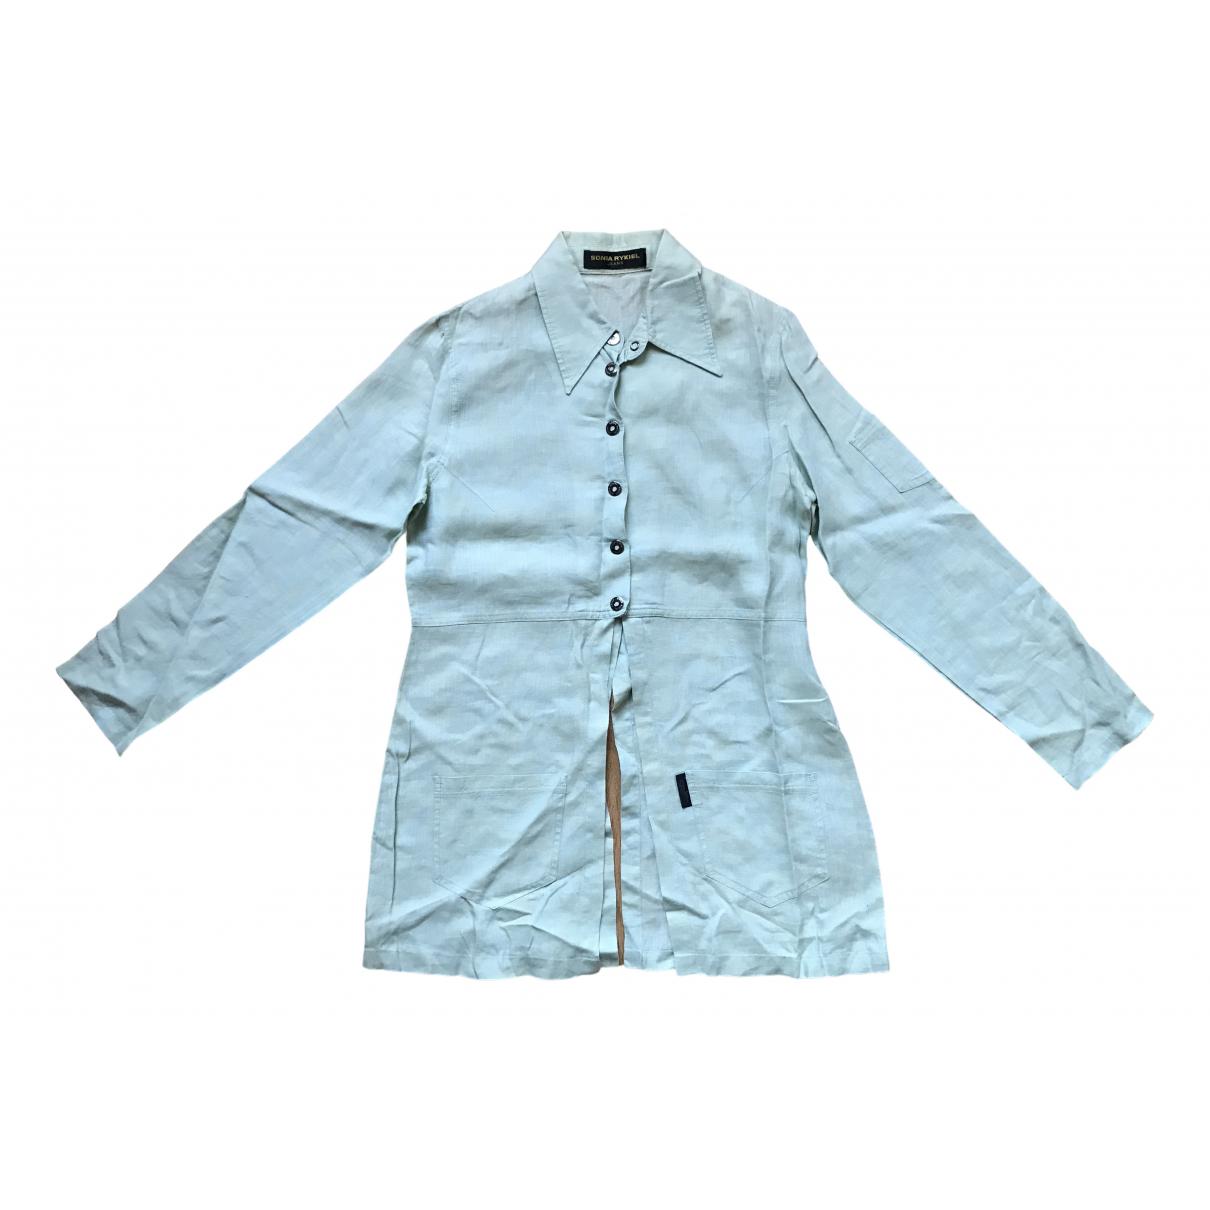 Sonia Rykiel - Top   pour femme en coton - vert